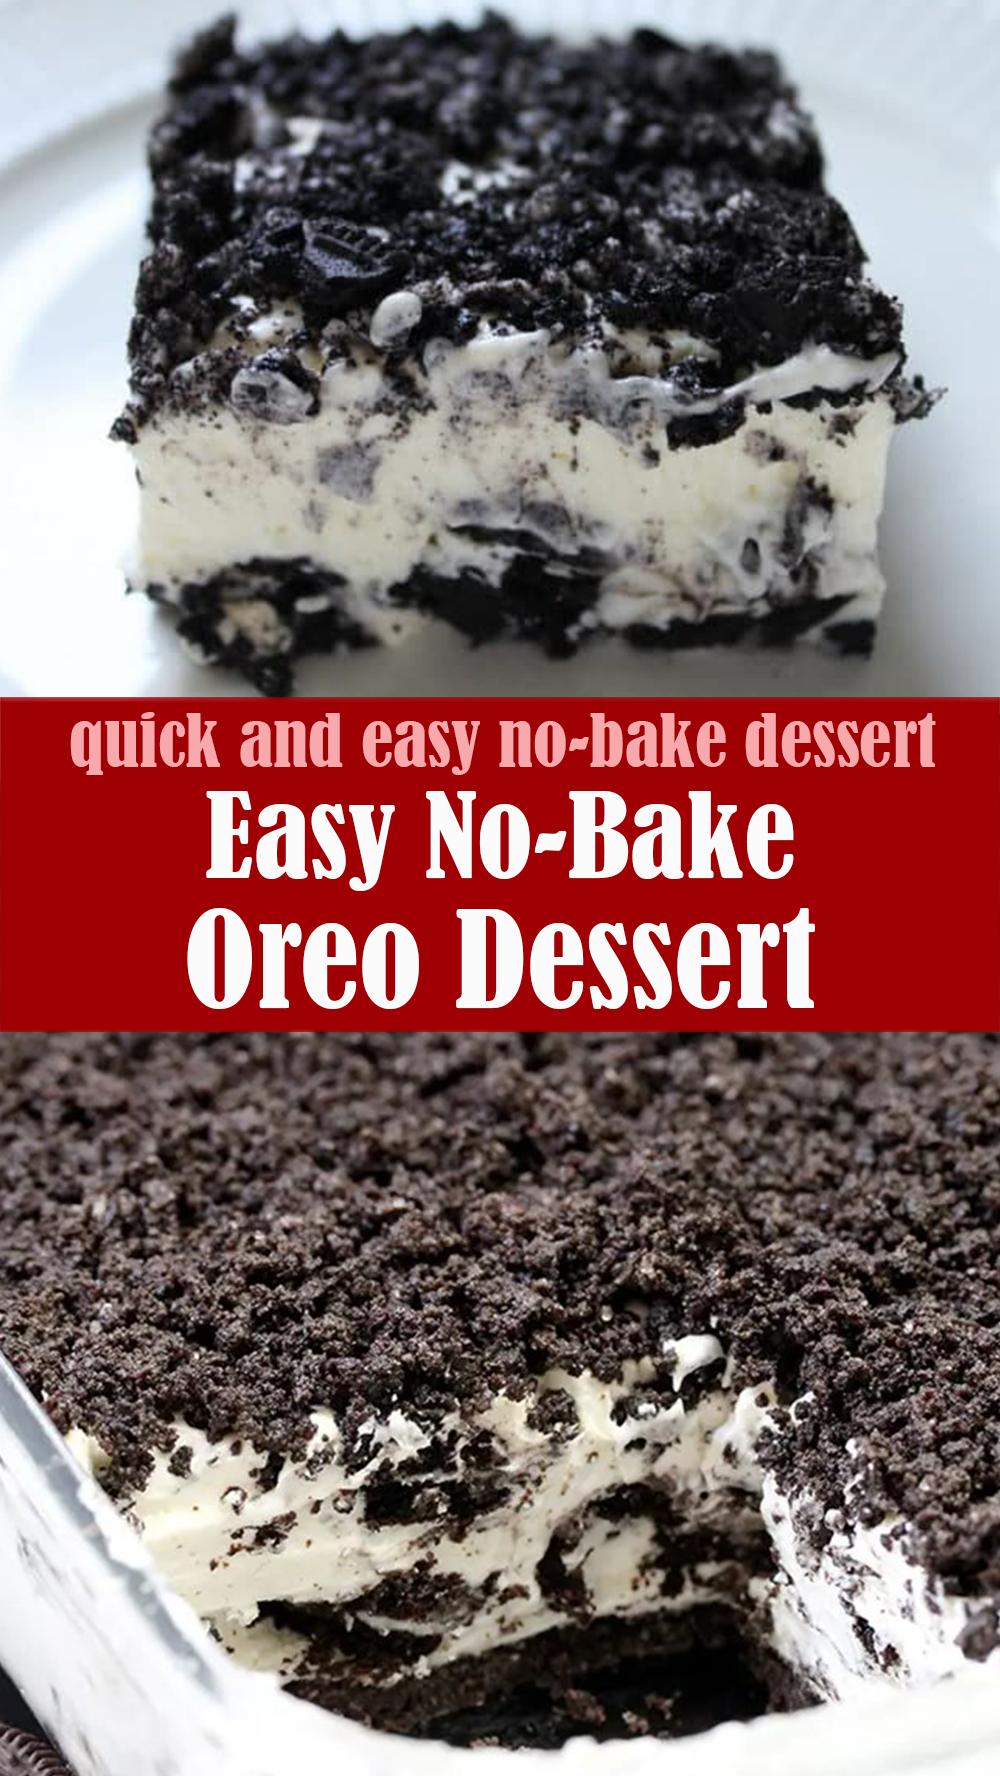 Quick & Easy No-Bake Oreo Dessert